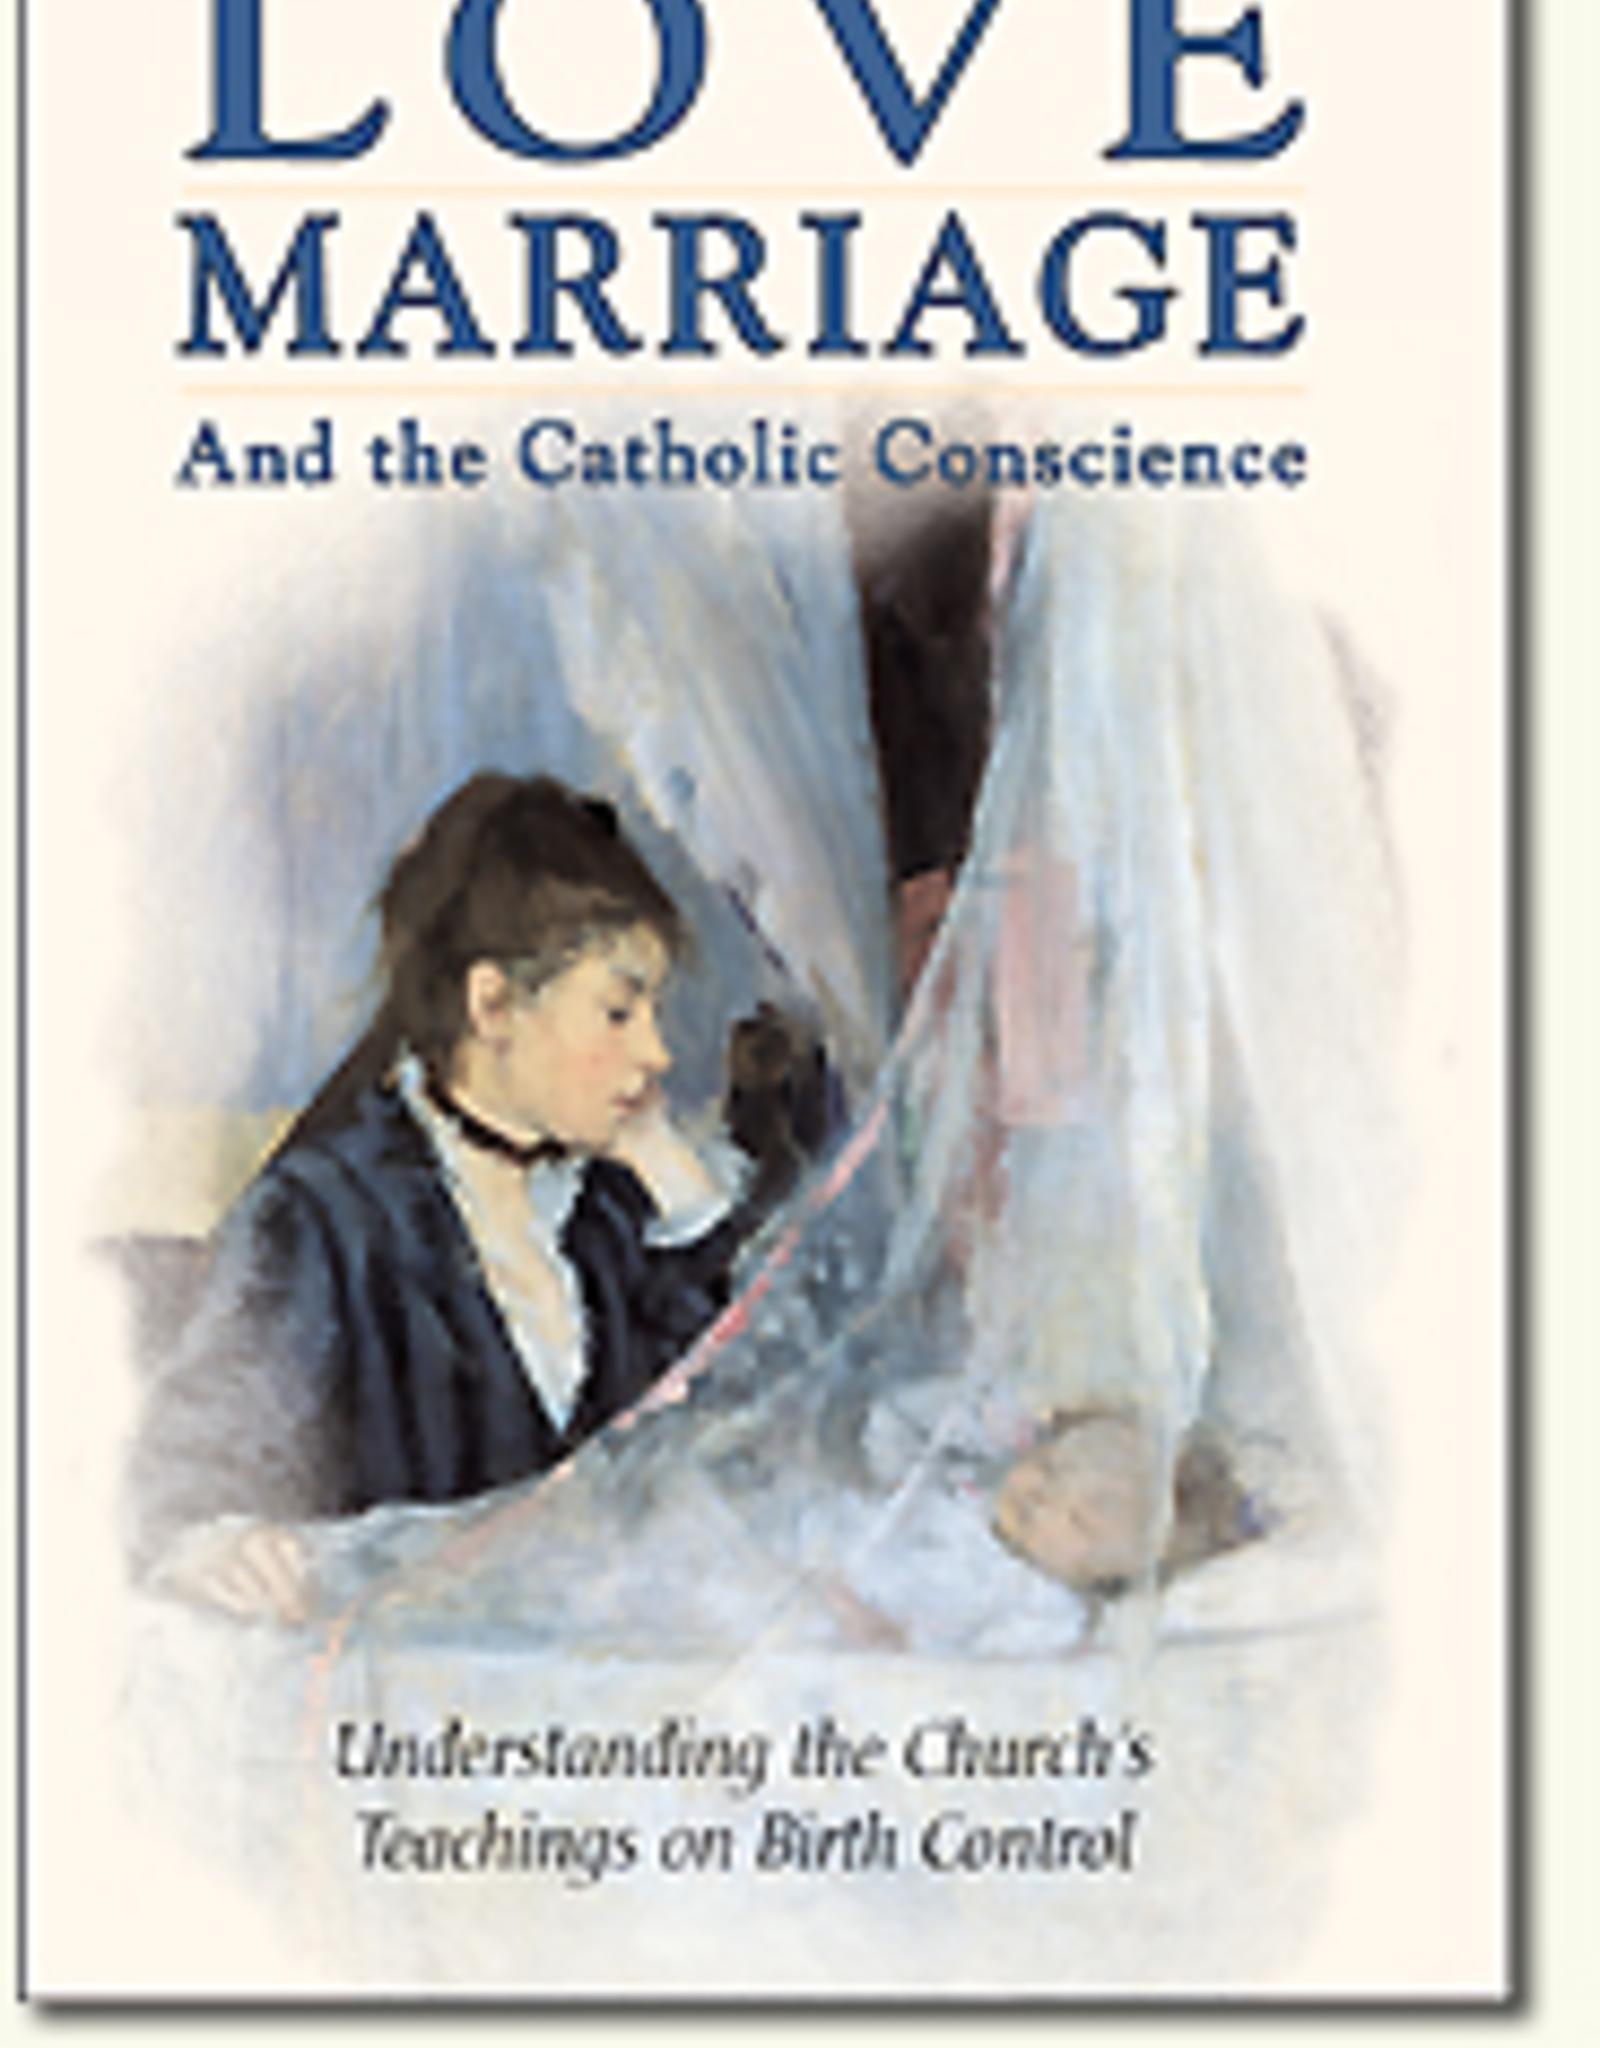 Sophia Institute Love, Marriage & the Catholic Conscience, by Dr. Dietrich von Hildebrand